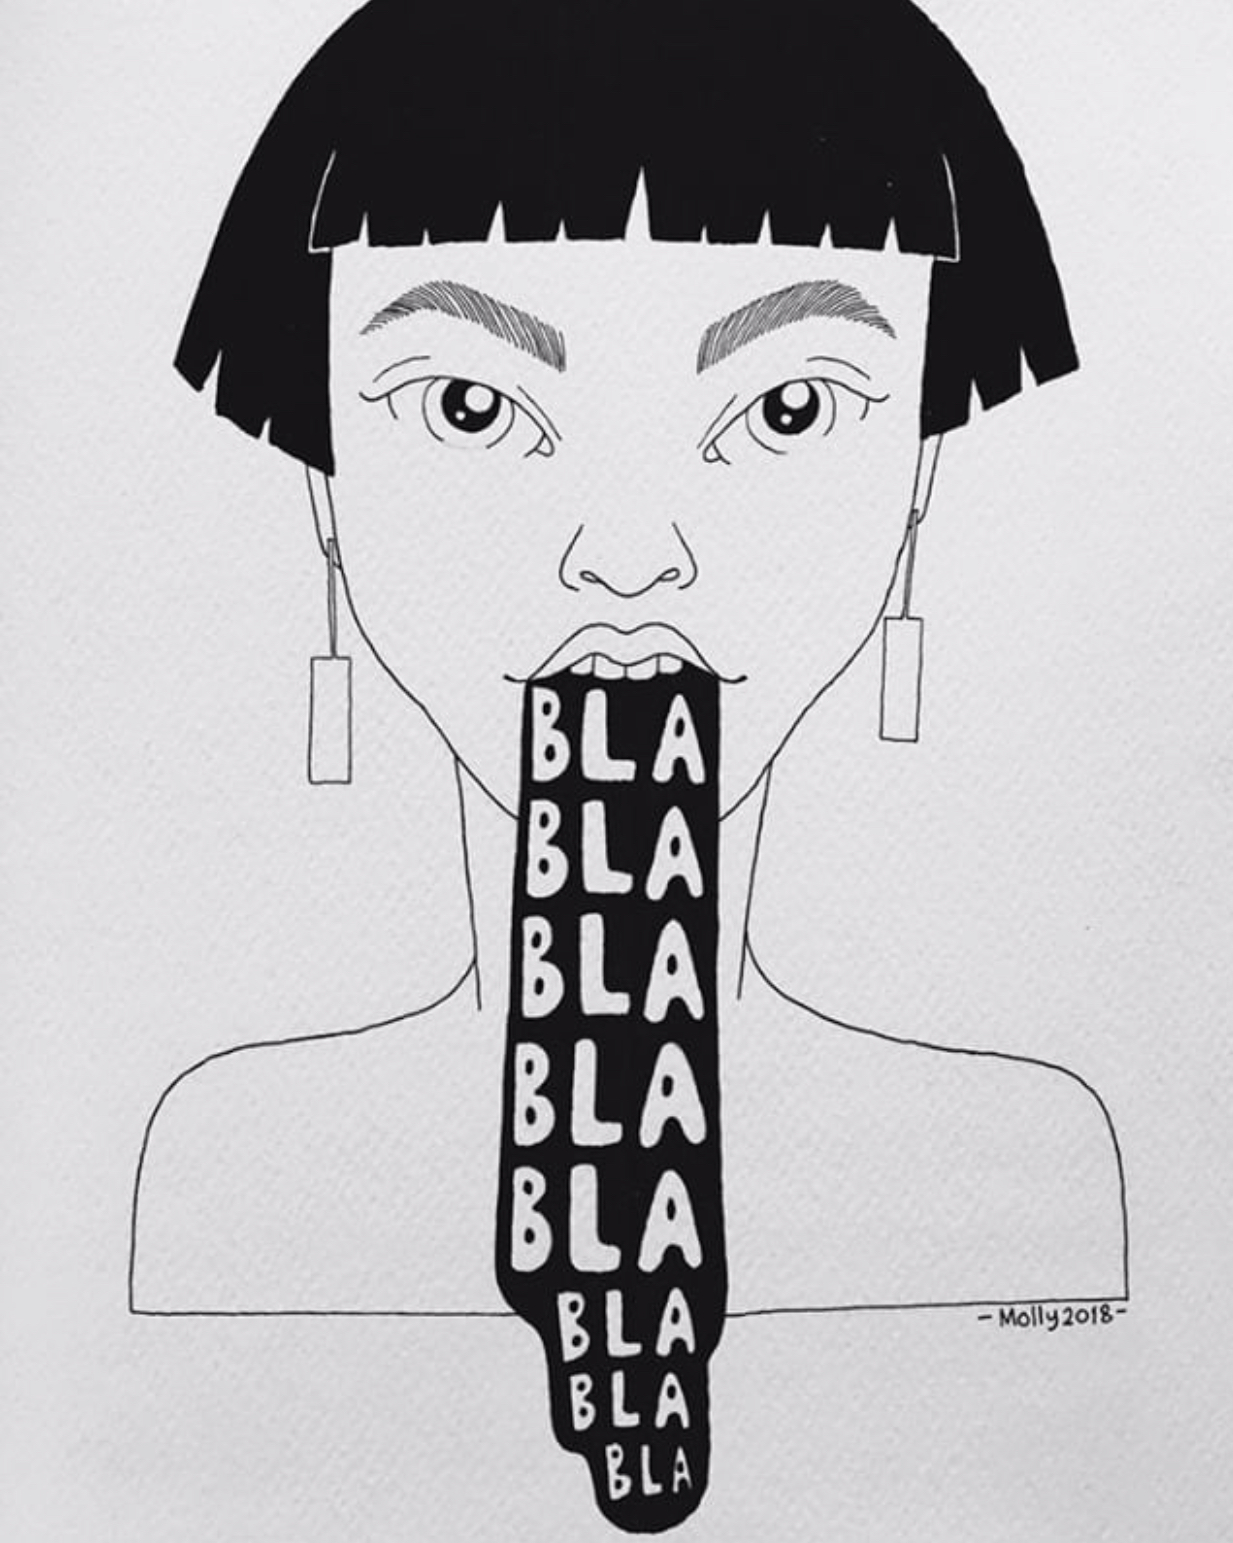 'All I Can Hear From You Is Bla Bla Bla Yadda Yadda Yadda'